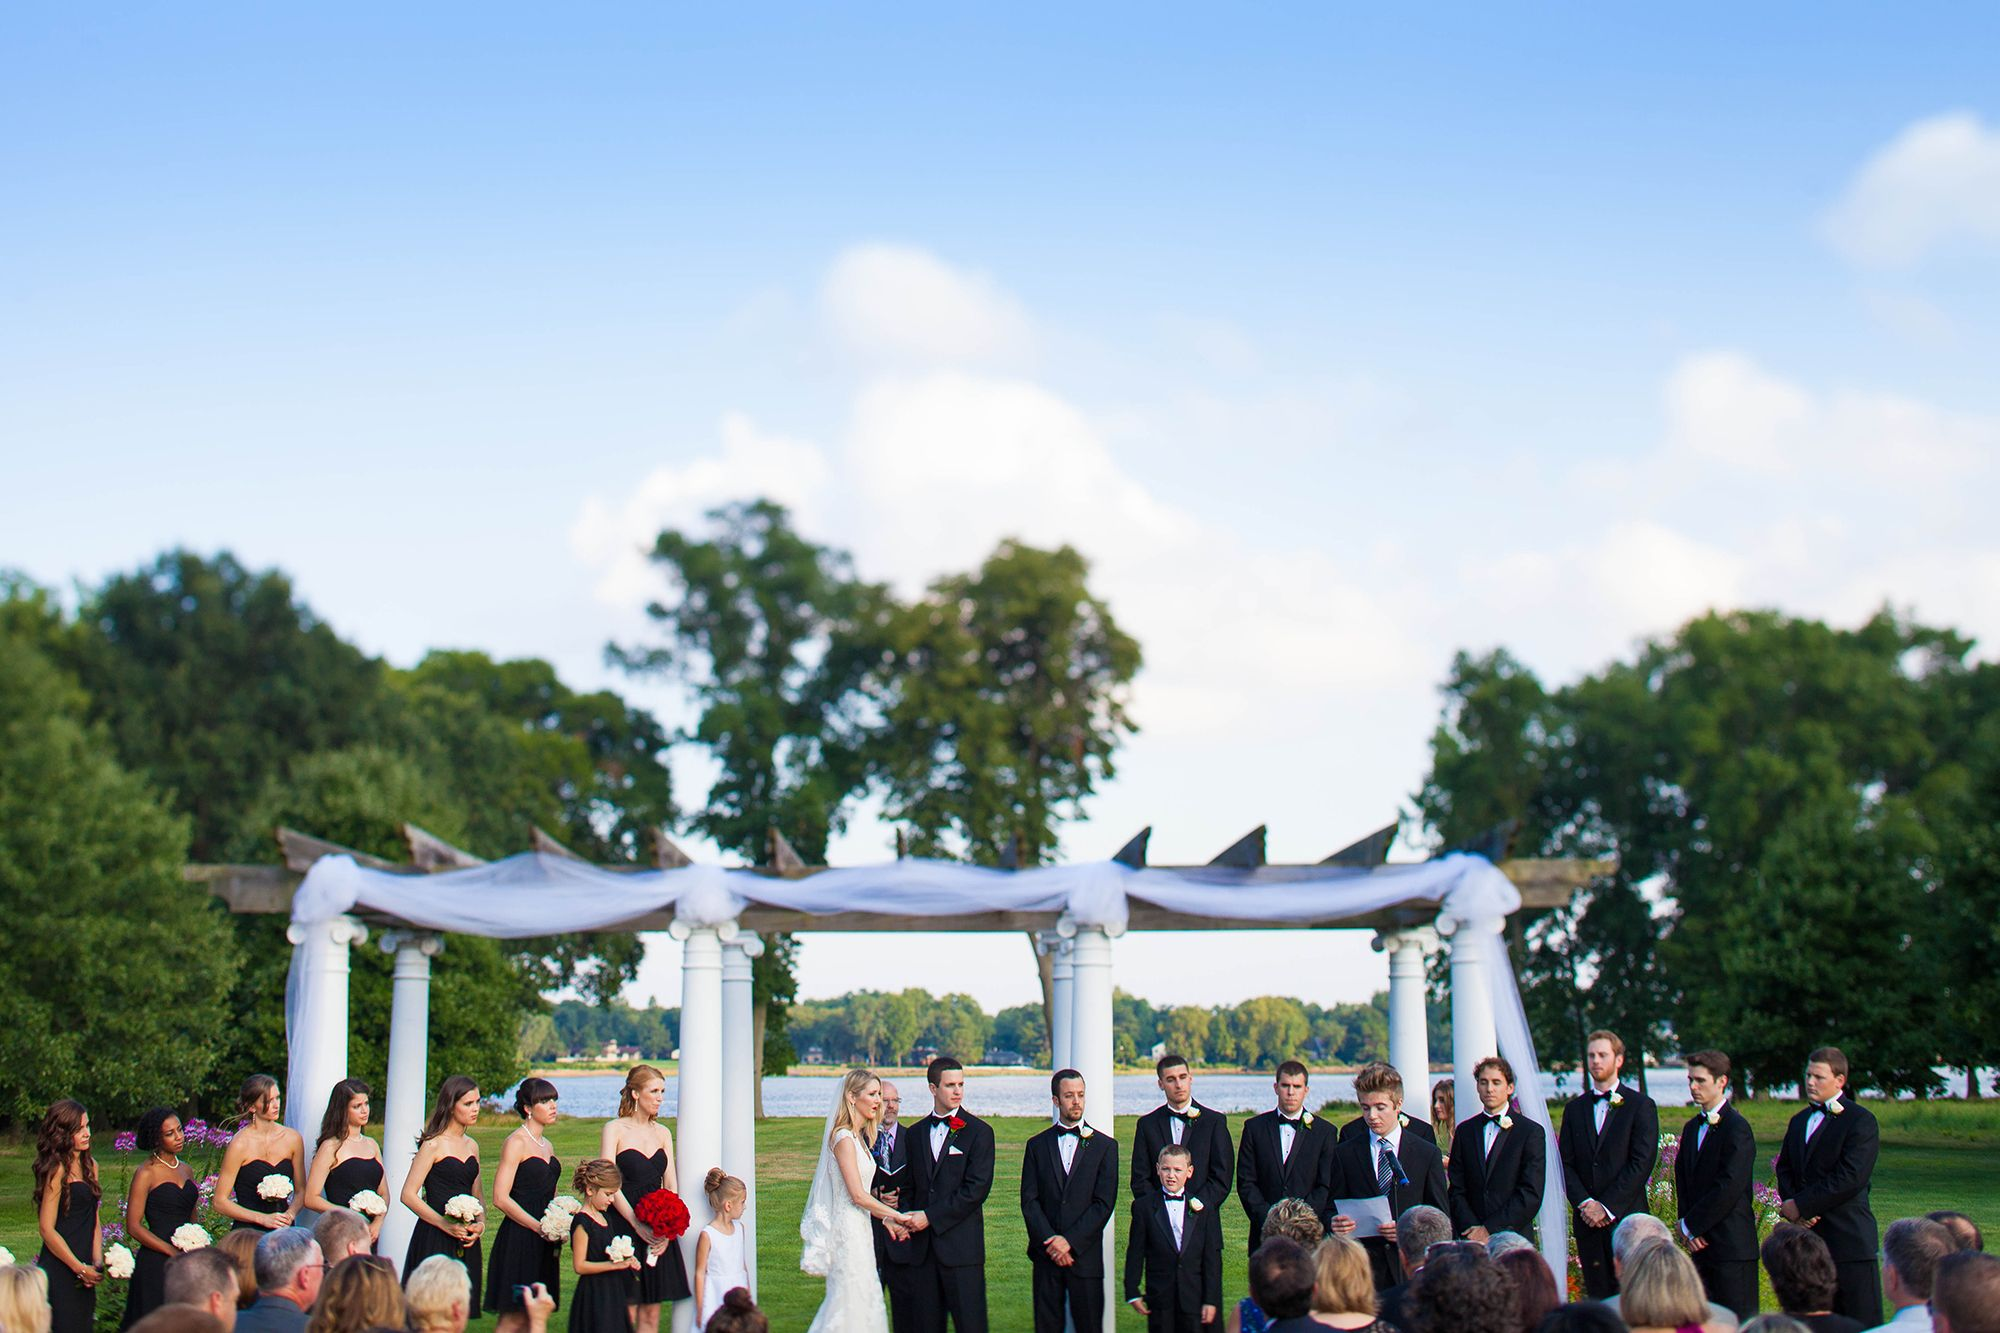 Outdoor wedding venues near Philadelphia Bucks County